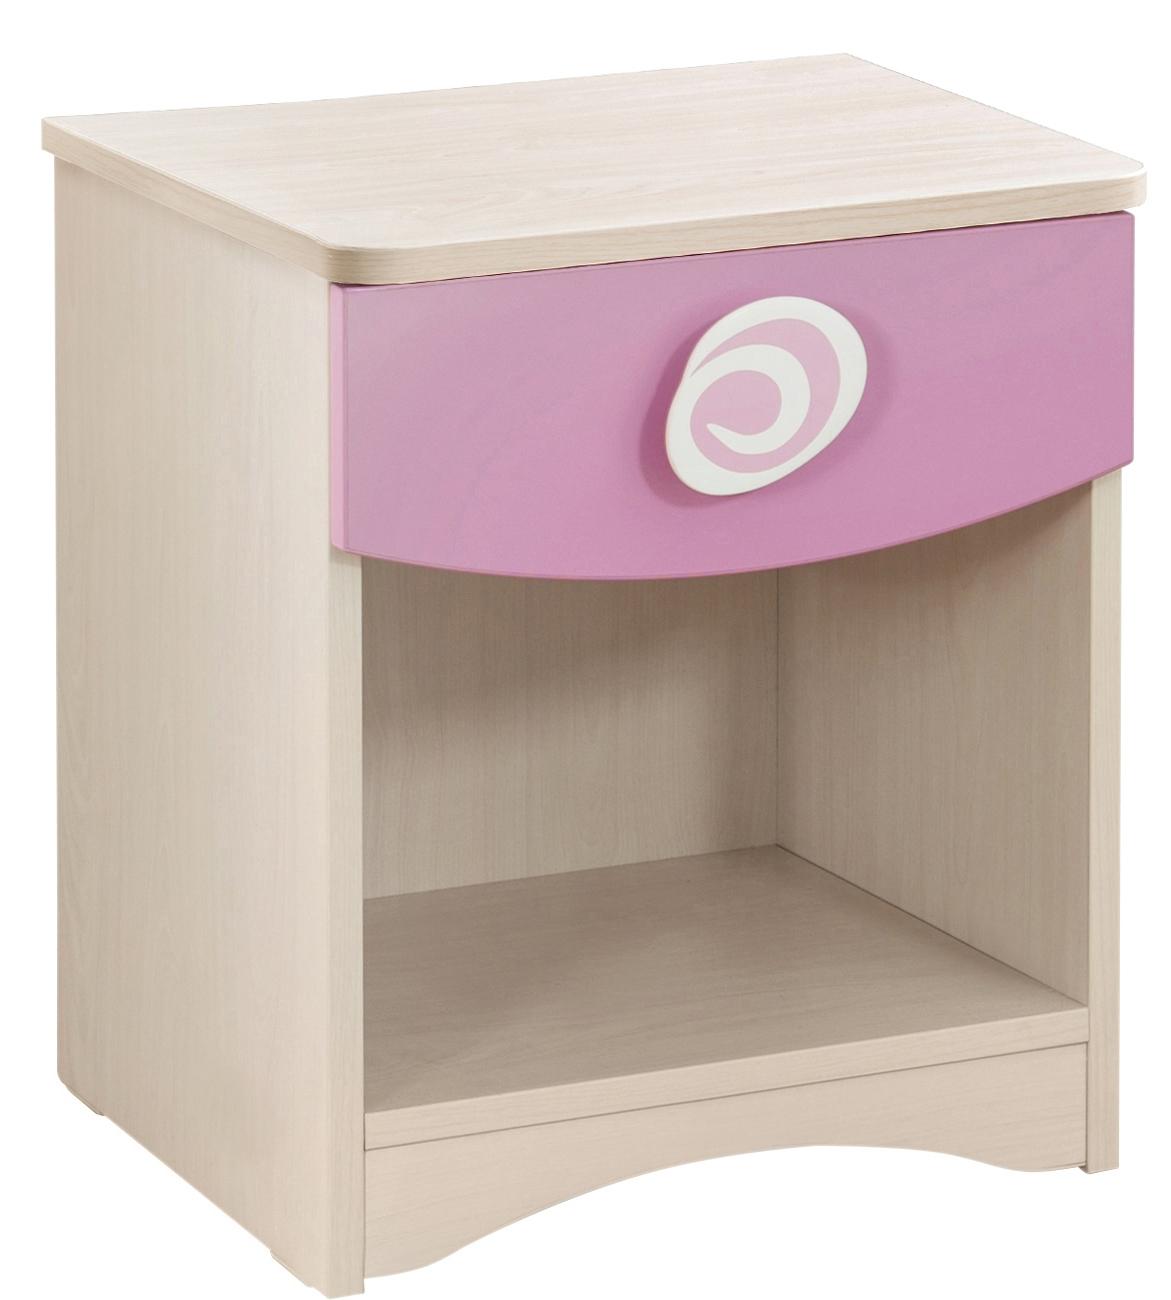 Noptiera din pal cu 1 sertar, pentru copii Little Princess Pink / Nature, l40xA41xH47 cm poza